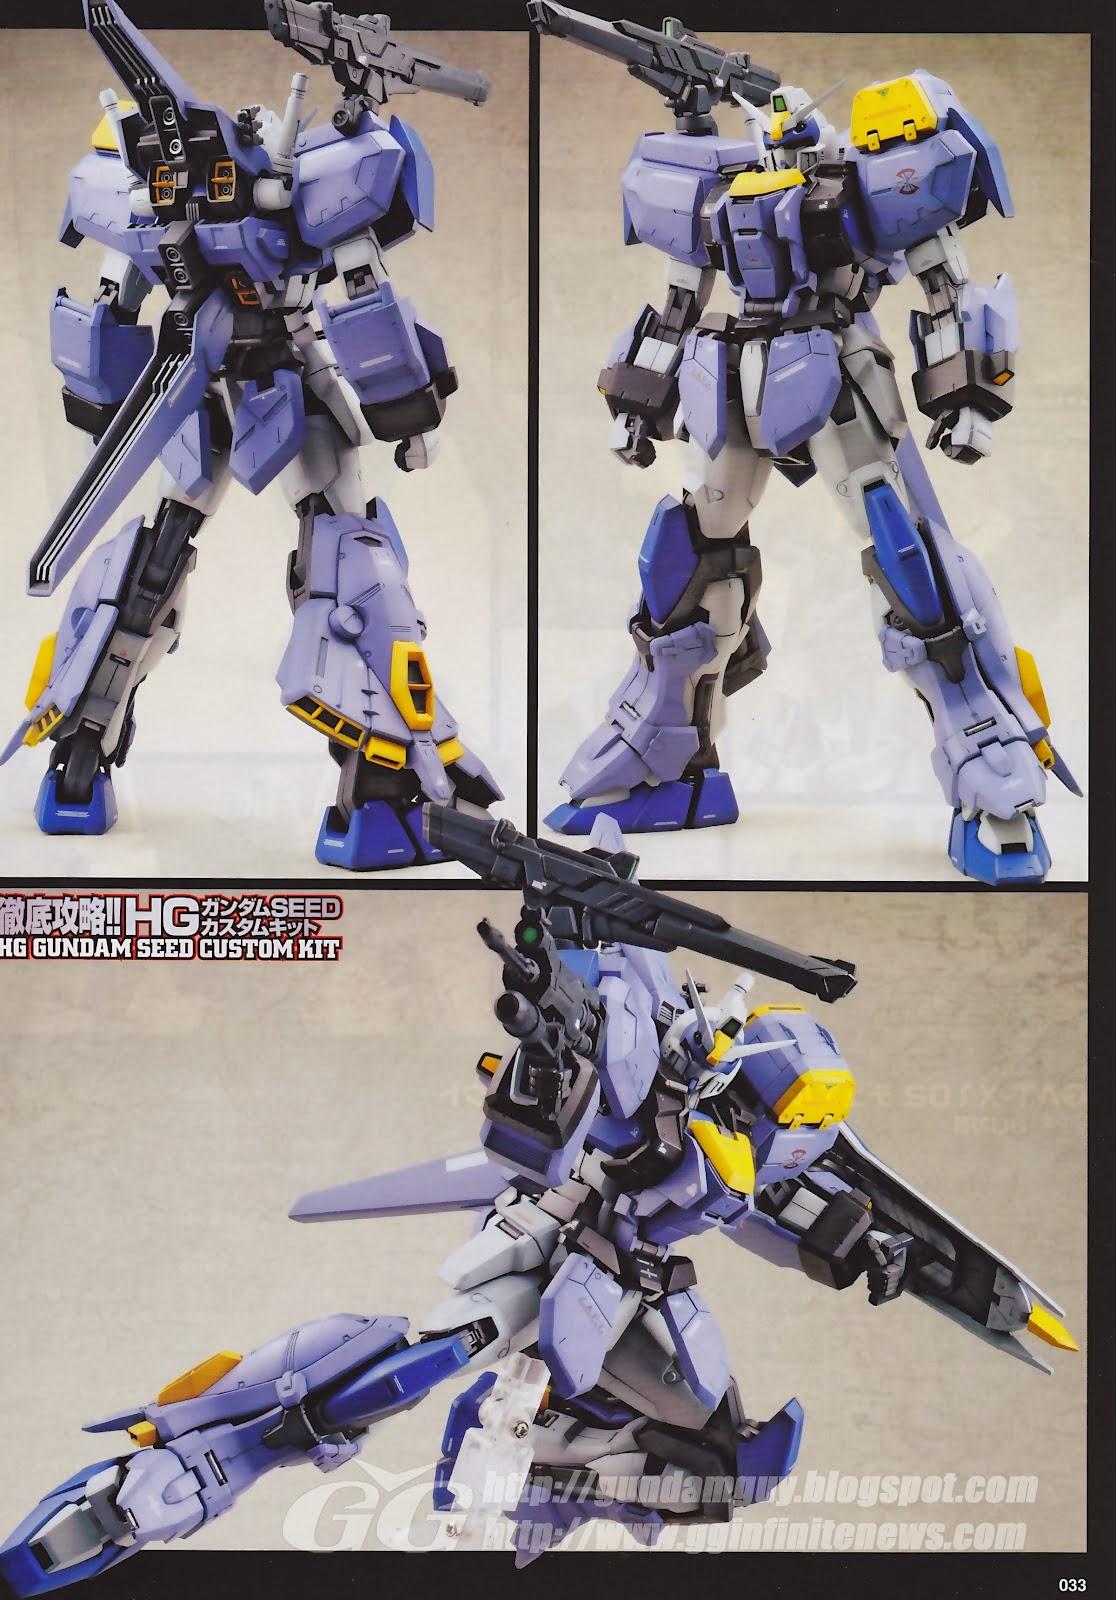 New Type Gat X102 Duel Gundam Modelled By Juniii